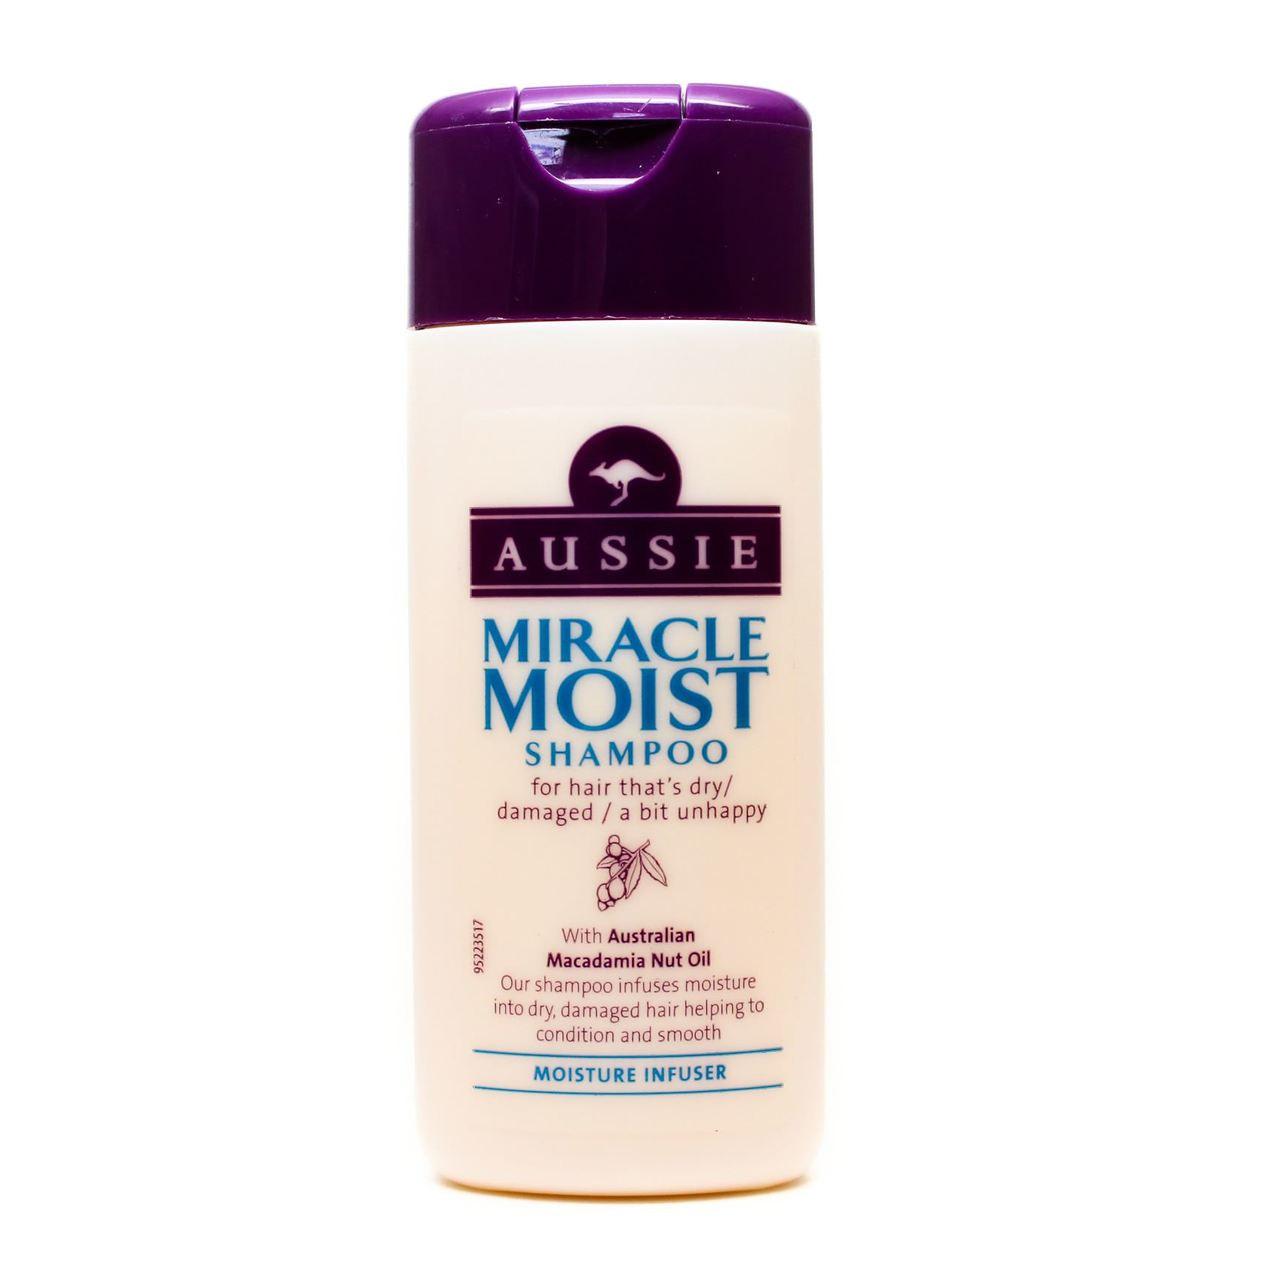 Aussie Miracle Moist Mini Shampoo 75ml Go Tiny